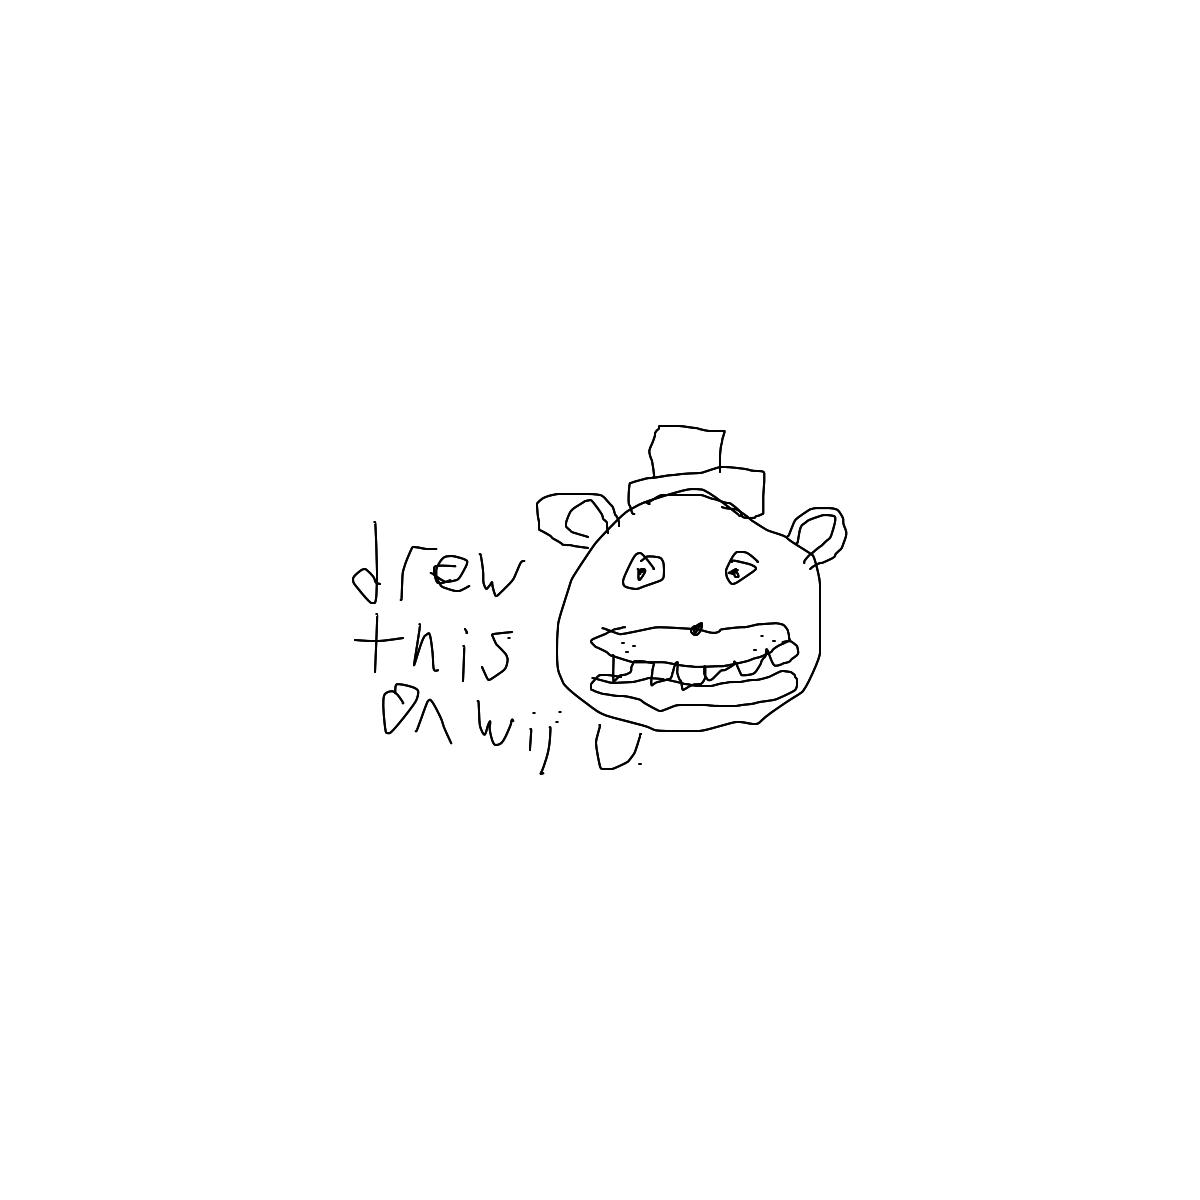 BAAAM drawing#6656 lat:44.4023933410644500lng: 21.3574161529541000